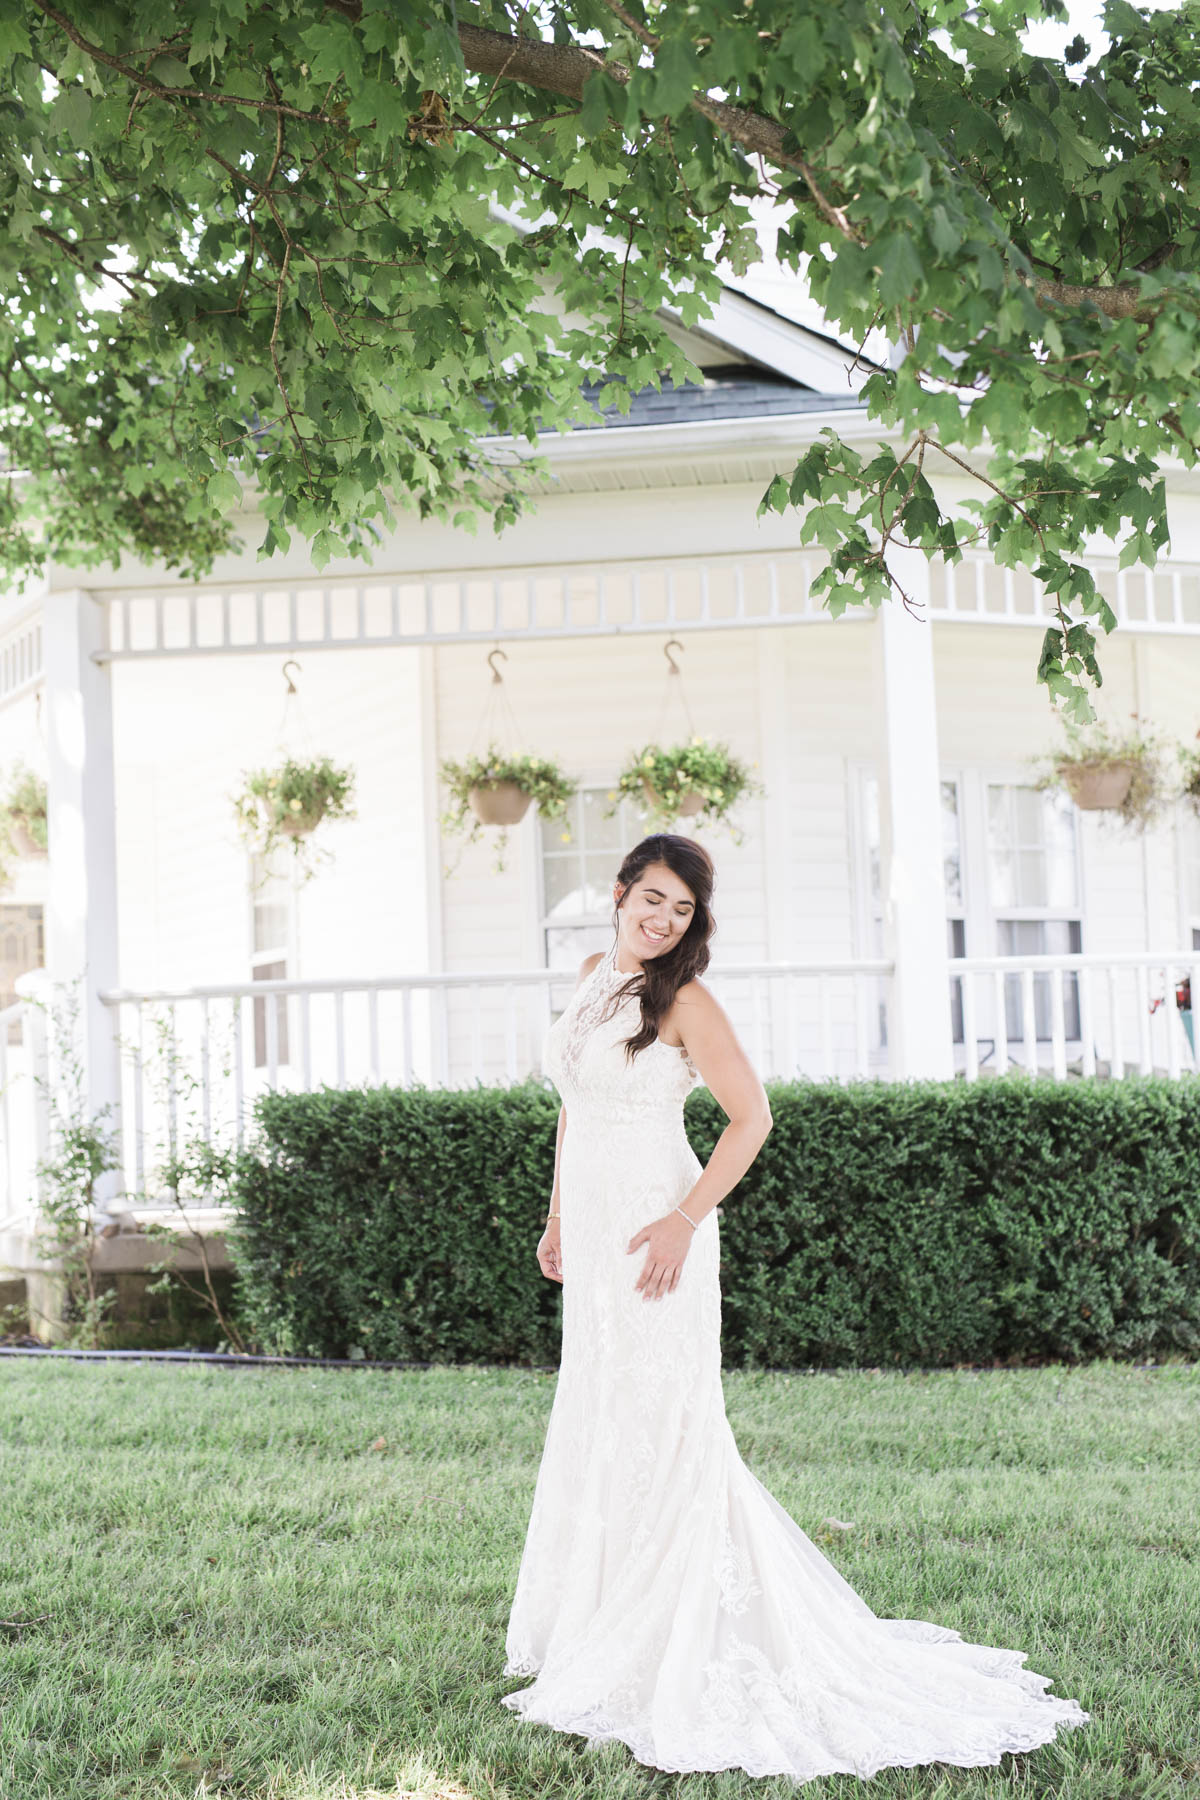 shotbychelsea_wedding_blog-17.jpg